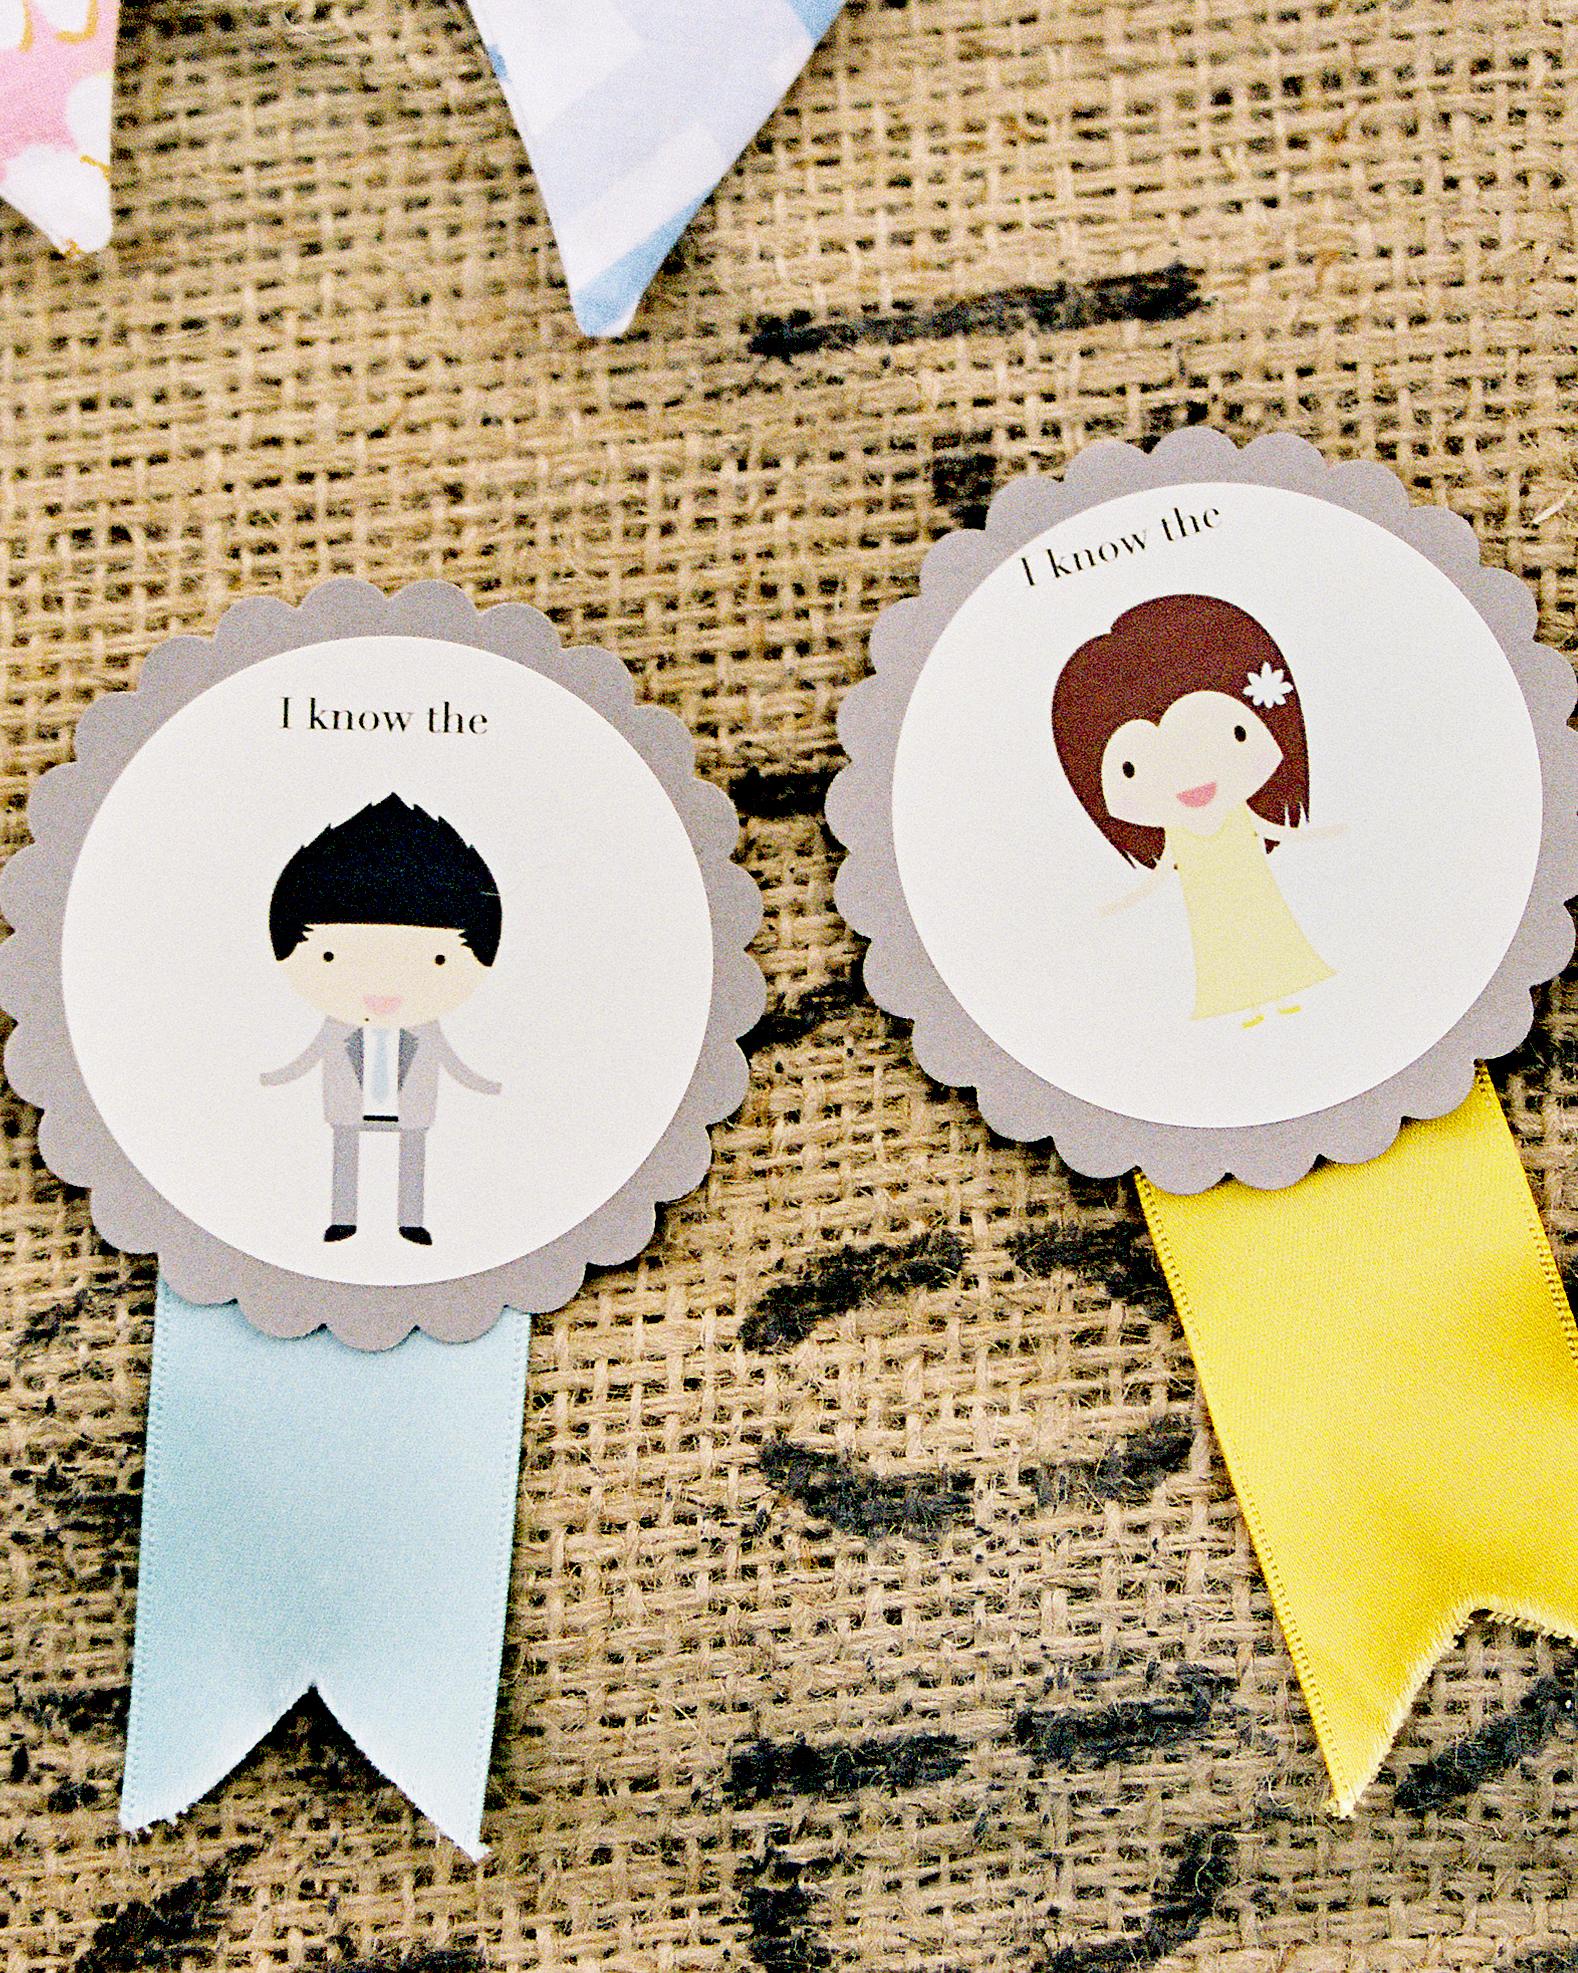 real-weddings-zoe-john-006747-R1-027-12.jpg